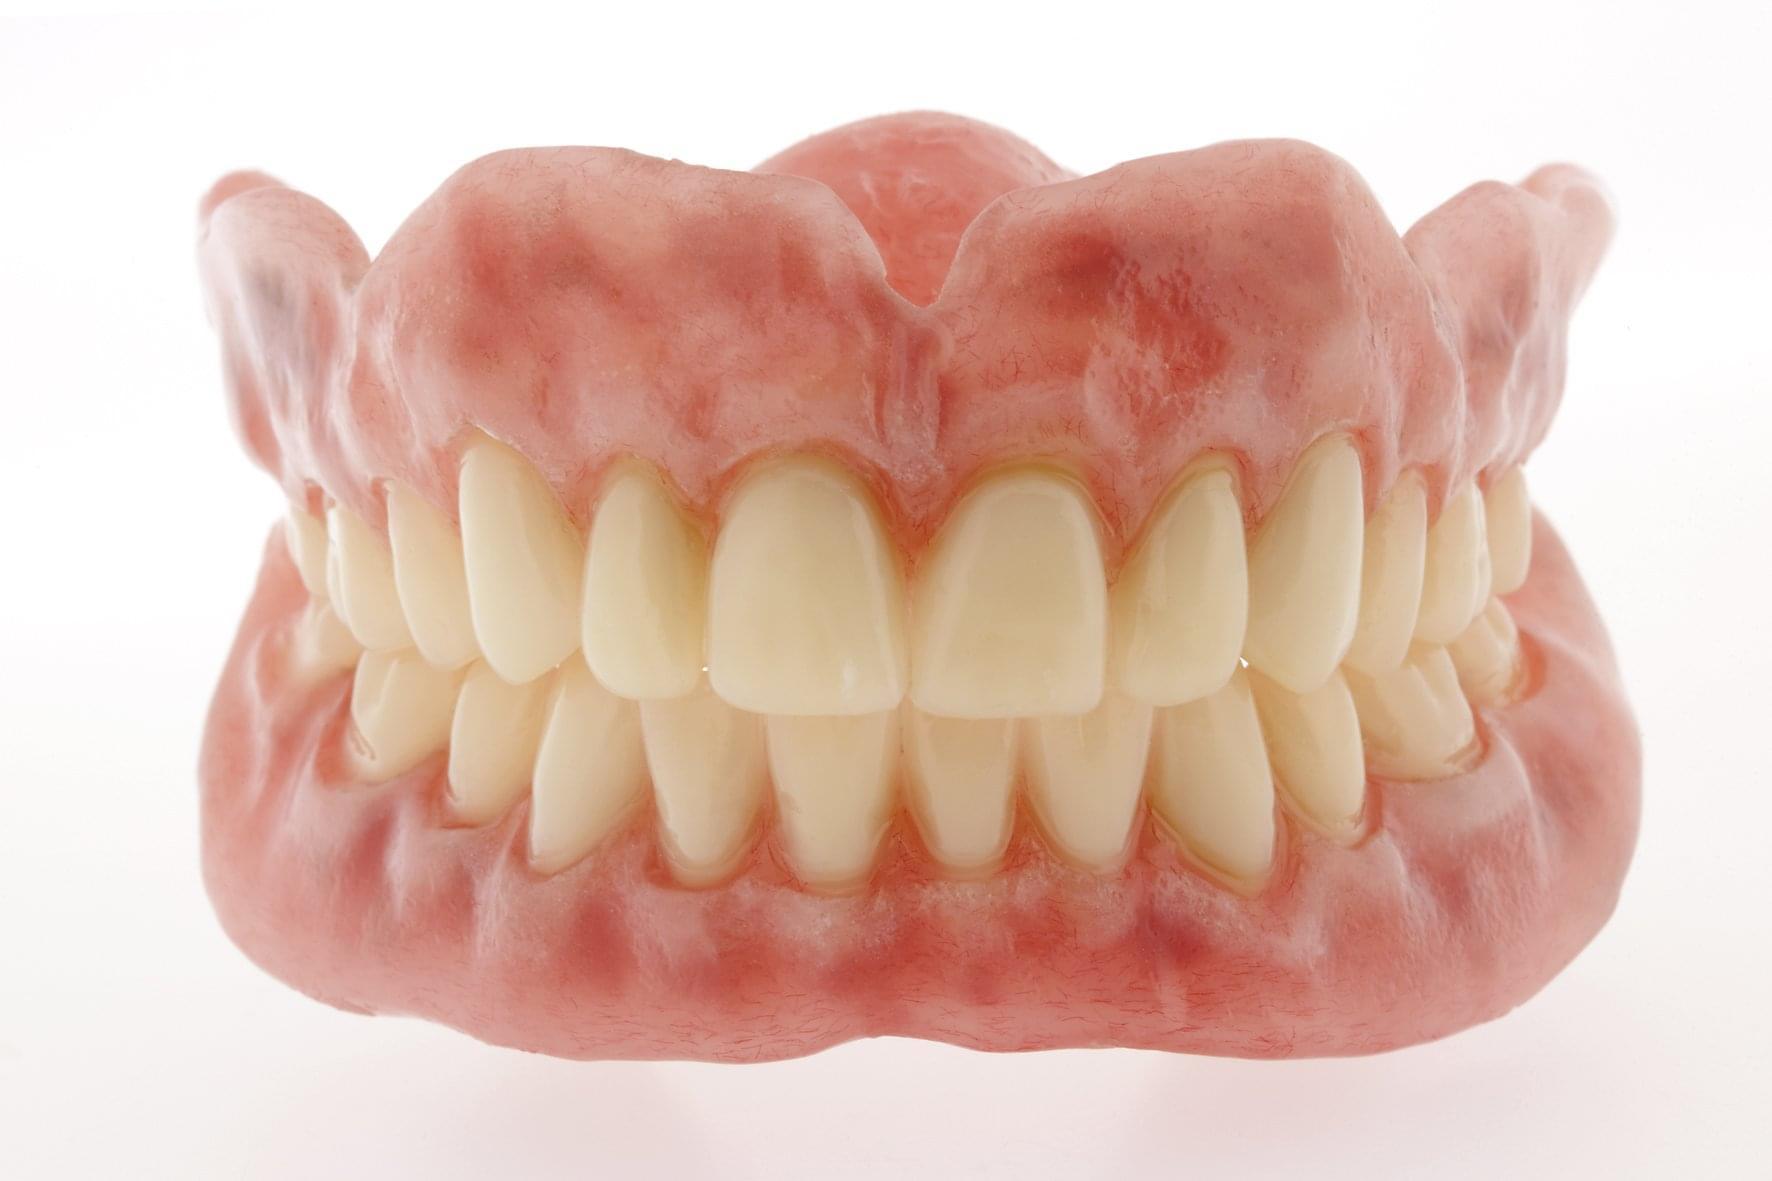 Dentures | Job Seekers